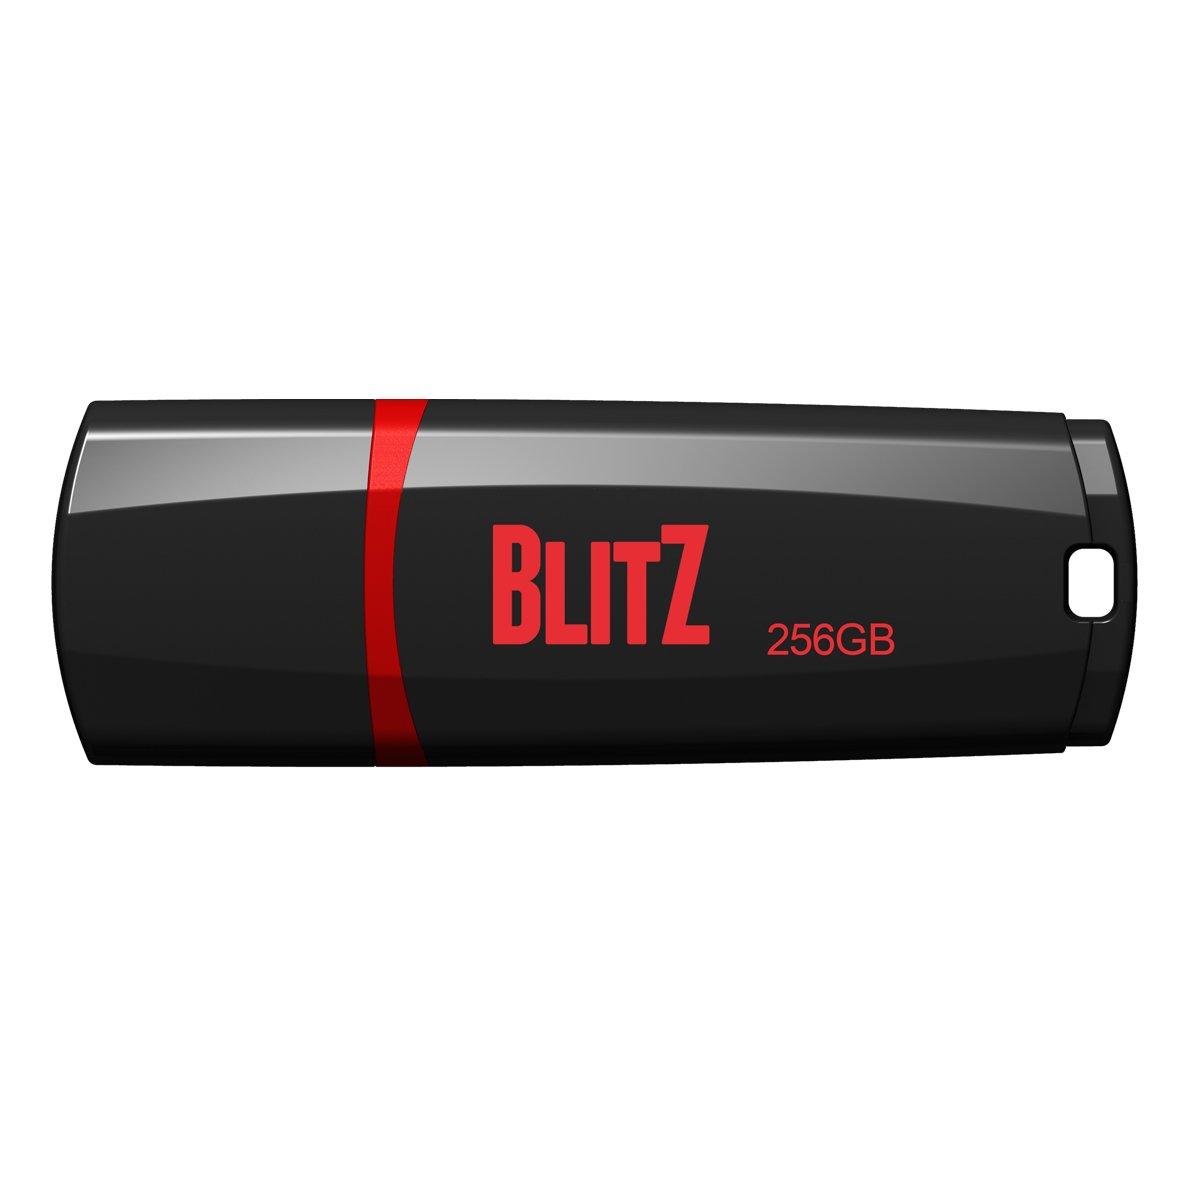 Patriot Blitz 256Gb Usb 3.1, Gen.1 Flash Drive (Black)